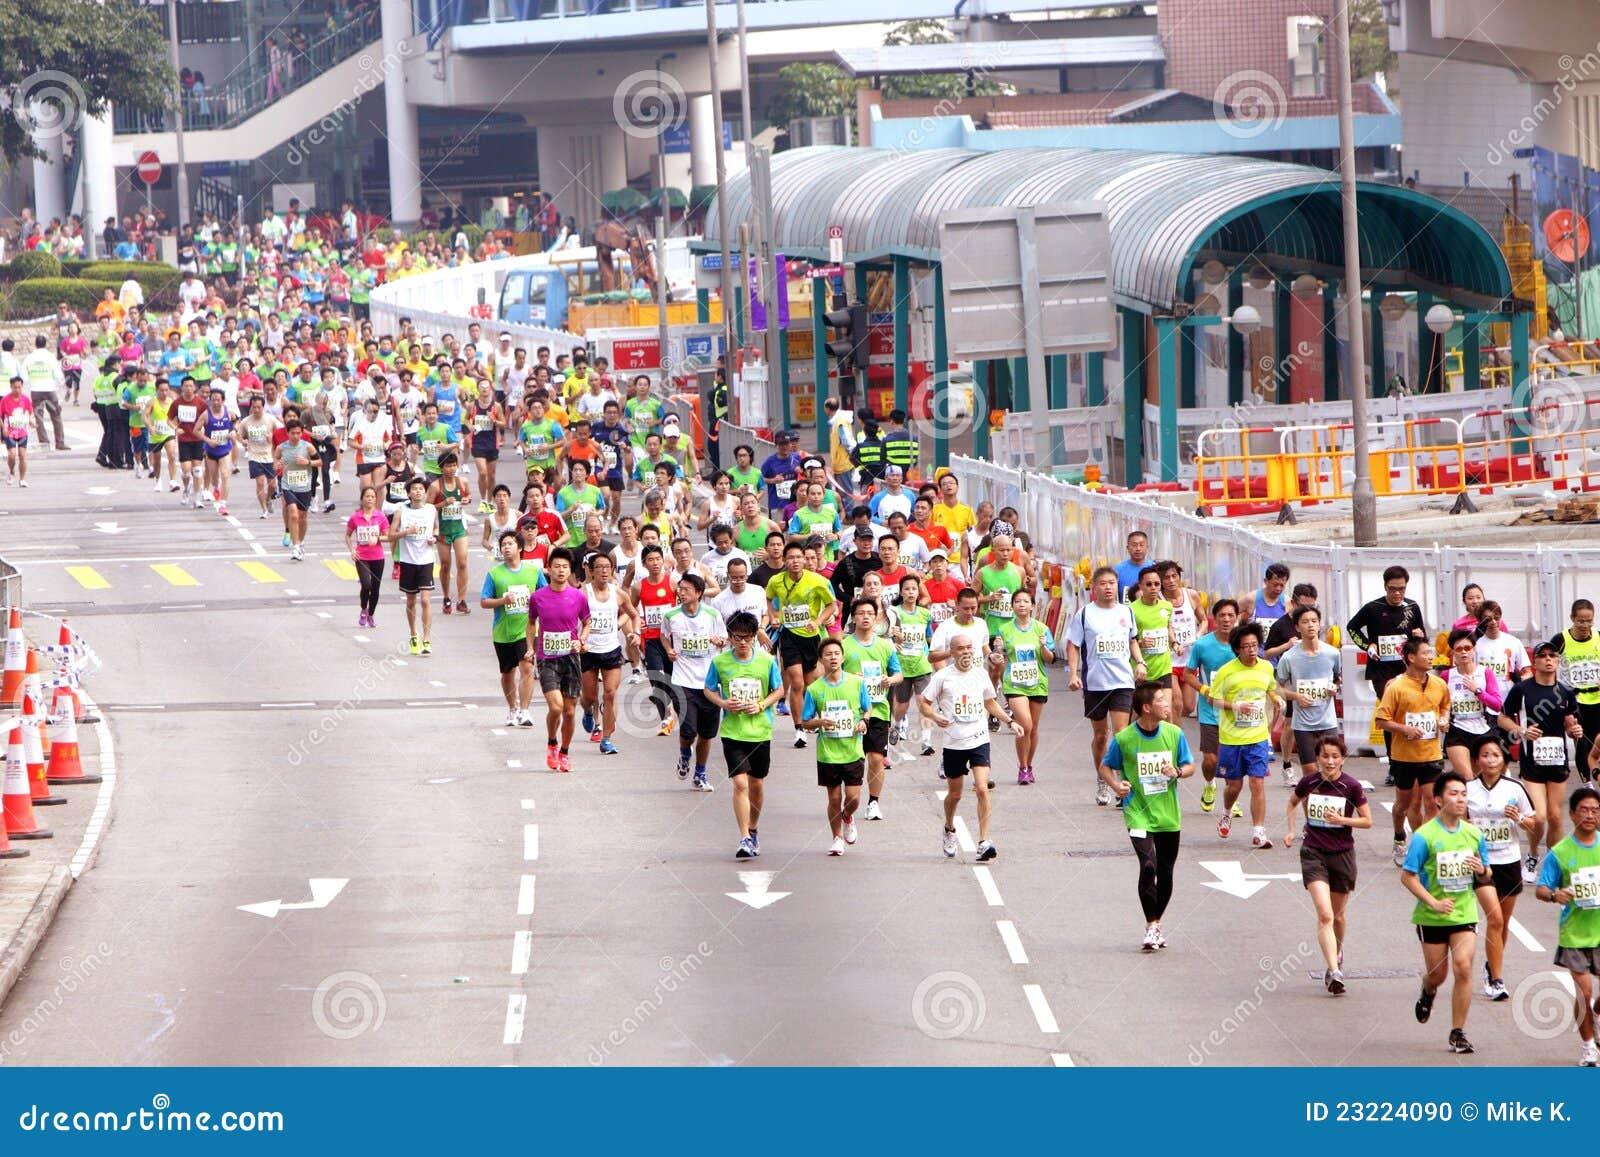 Business planning manager standard chartered marathon